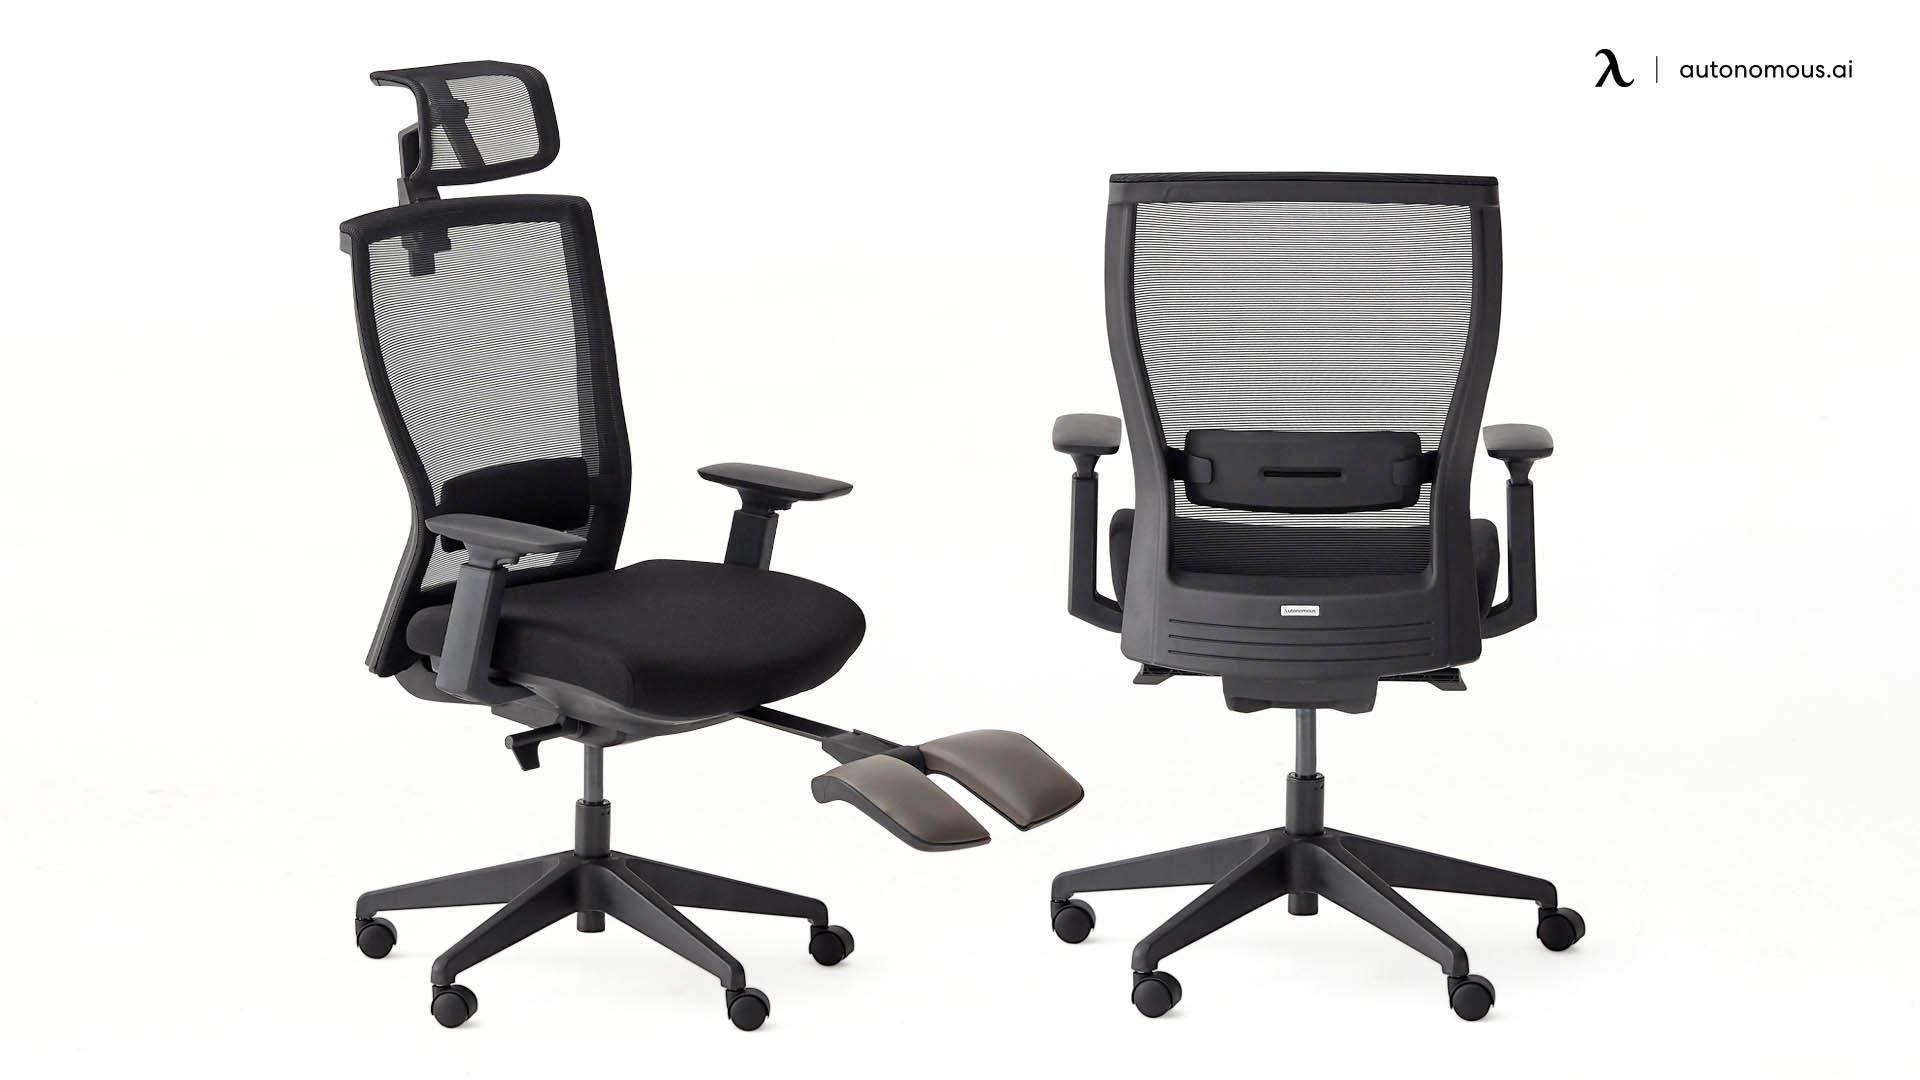 Autonomous MyoChair Ergonomic Chair